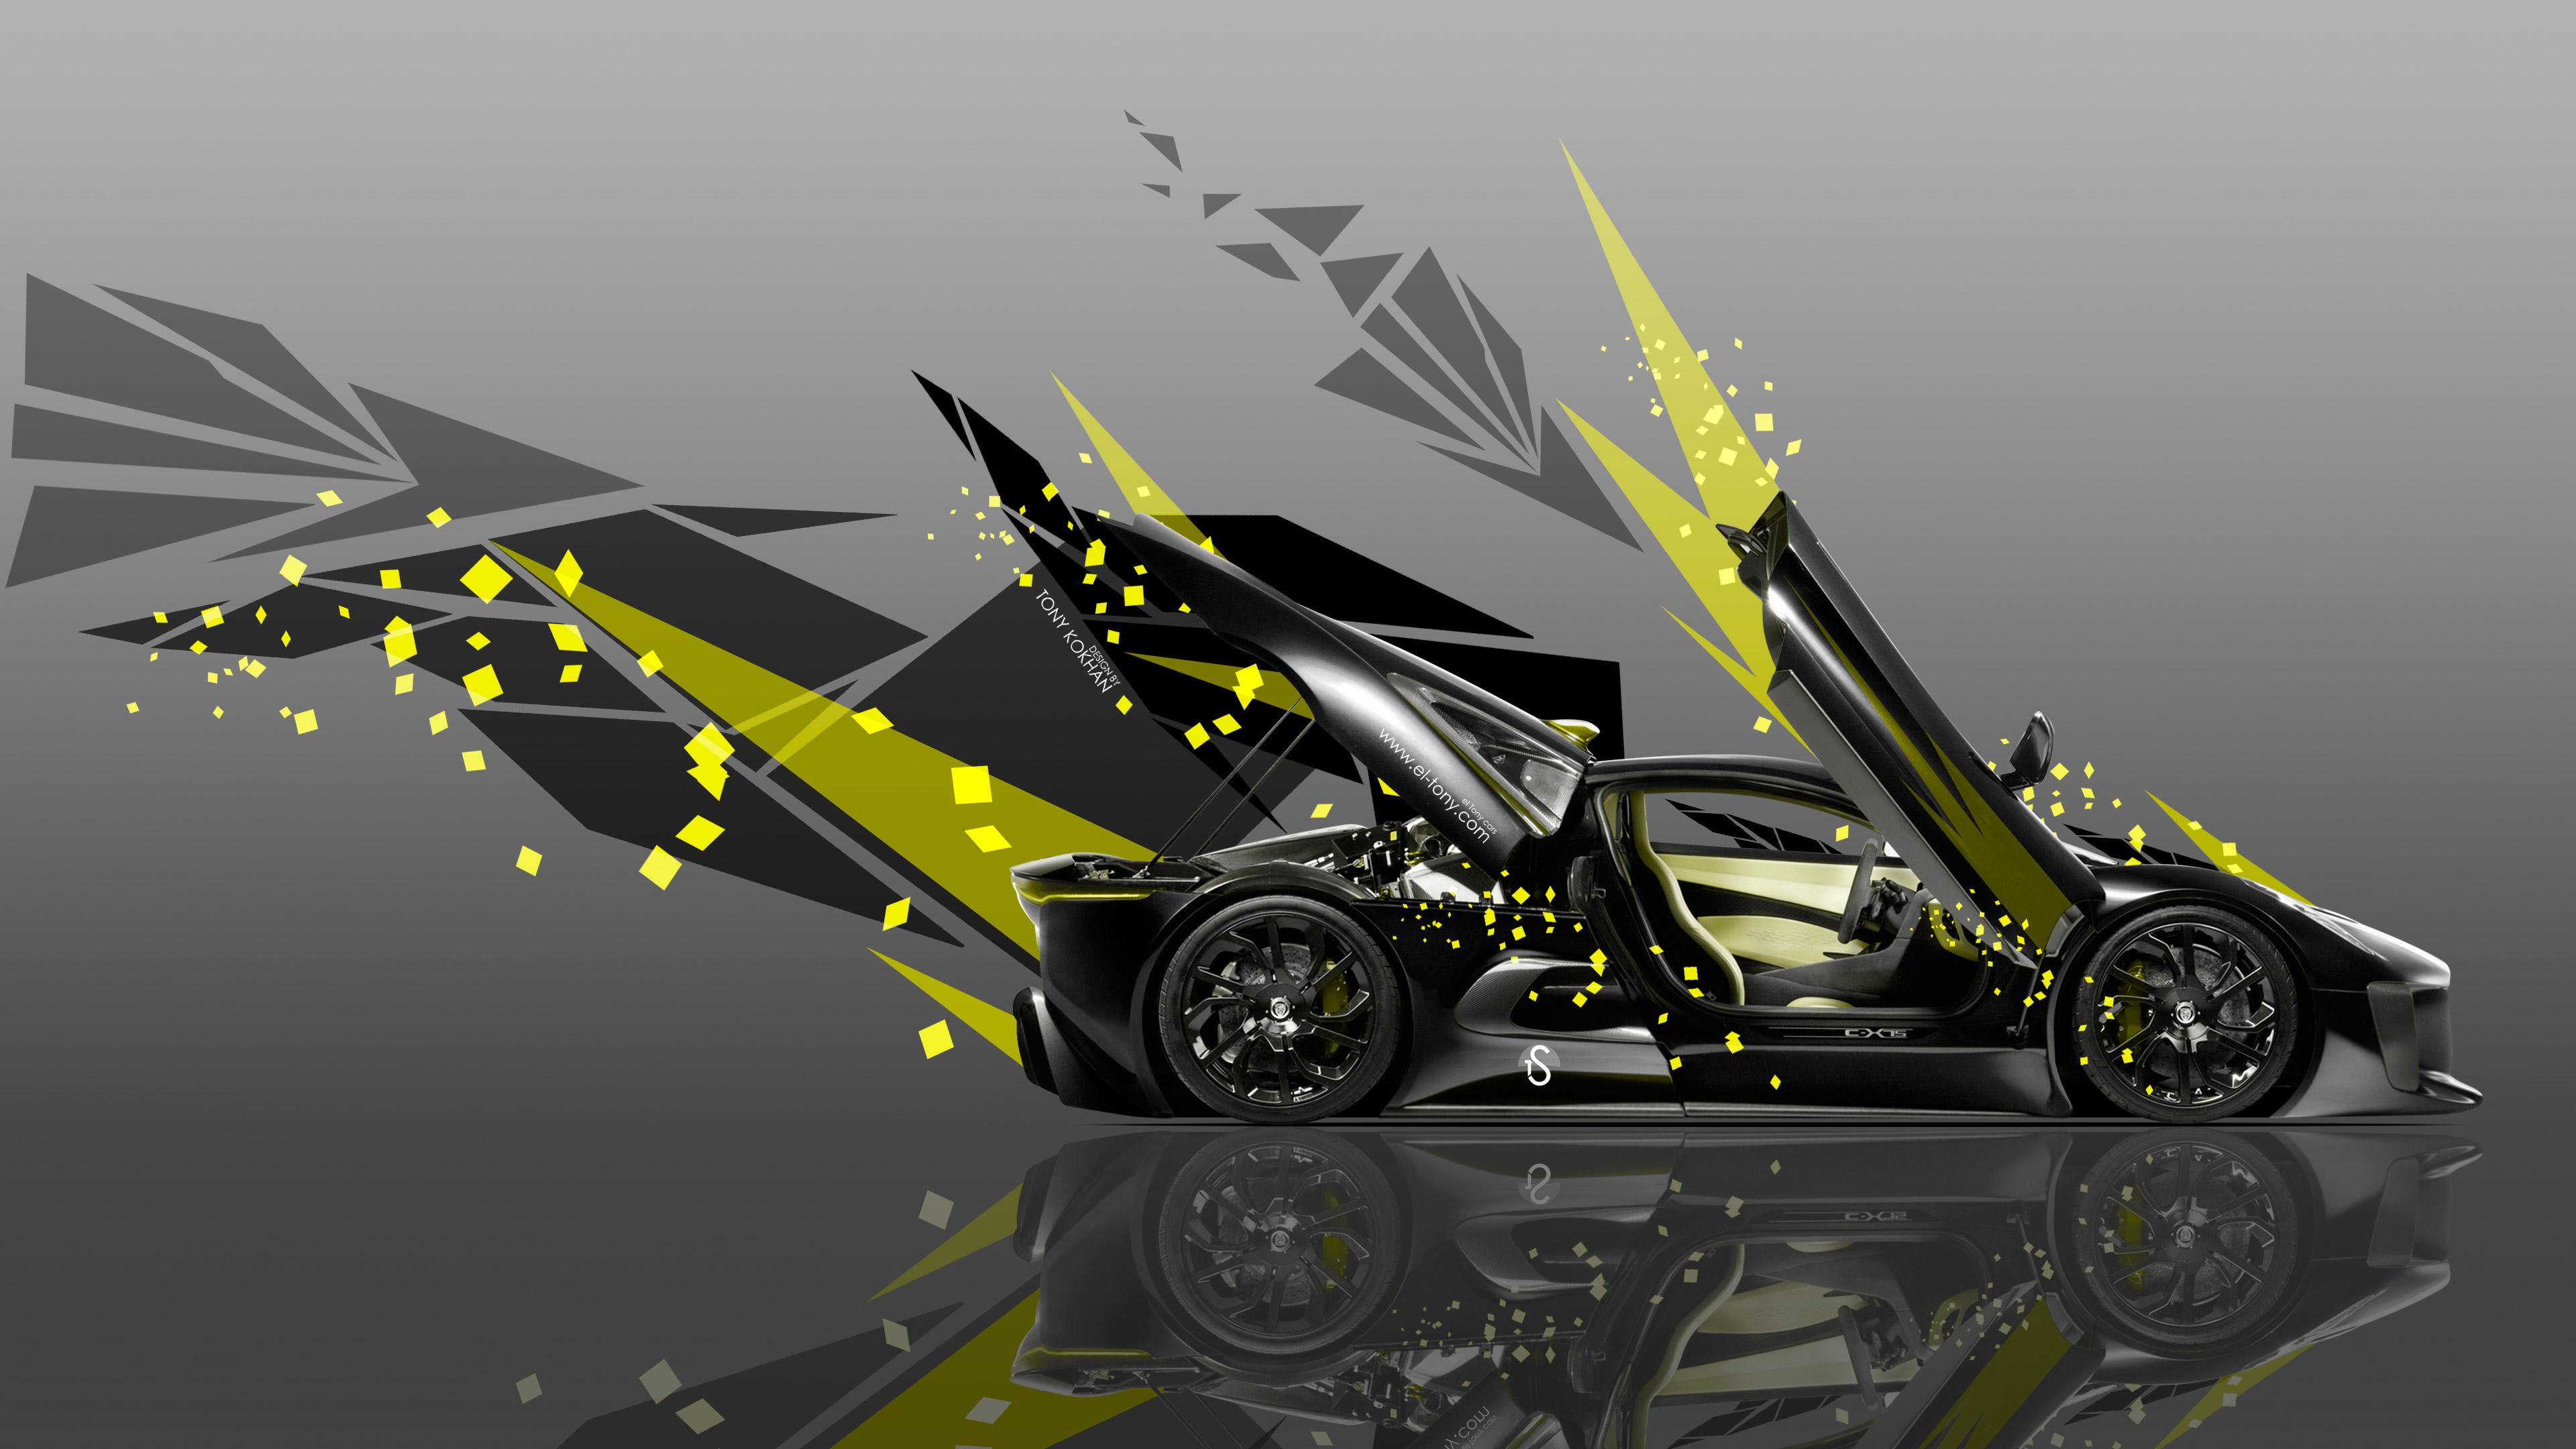 Jaguar-C-X75-Hybrid-Open-Door-Hood-Side-Abstract-Transformer-Car-2014-Art-Yellow-Colors-4K-Wallpapers-design-by-Tony-Kokhan-www.el-tony.com_.jpg